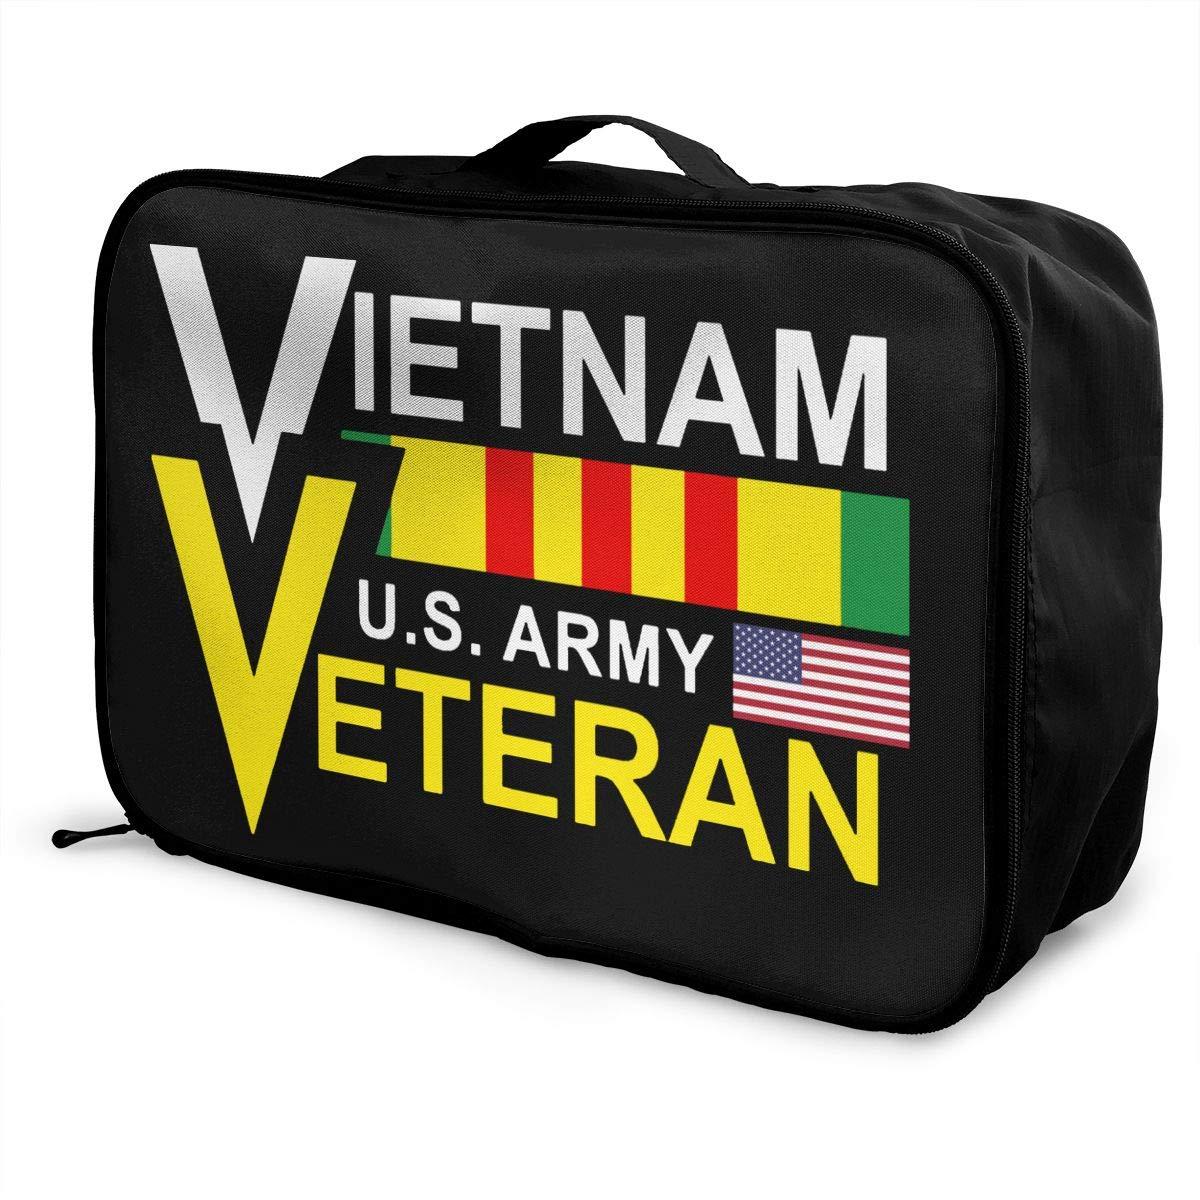 US ARMY VIETNAM VETERAN Travel Bag Men Women 3D Print Pattern Gift Portable Waterproof Oxford Cloth Luggage Bag